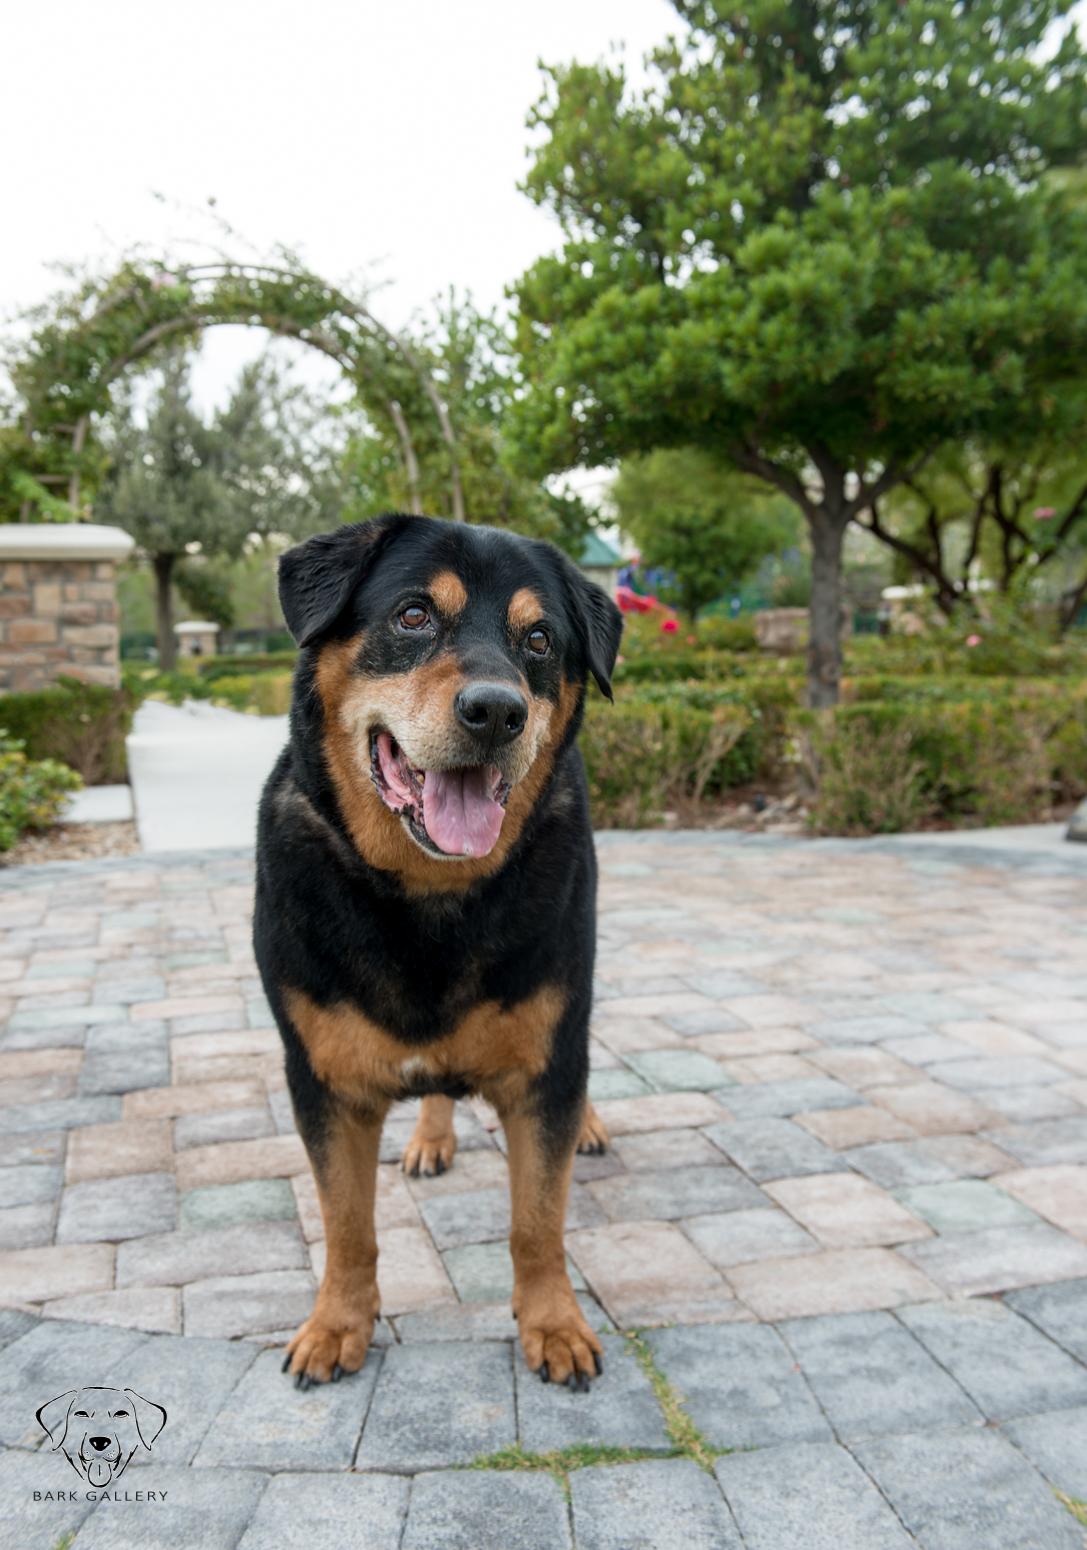 doggy-portrait-vegas-photographer-bark-gallery